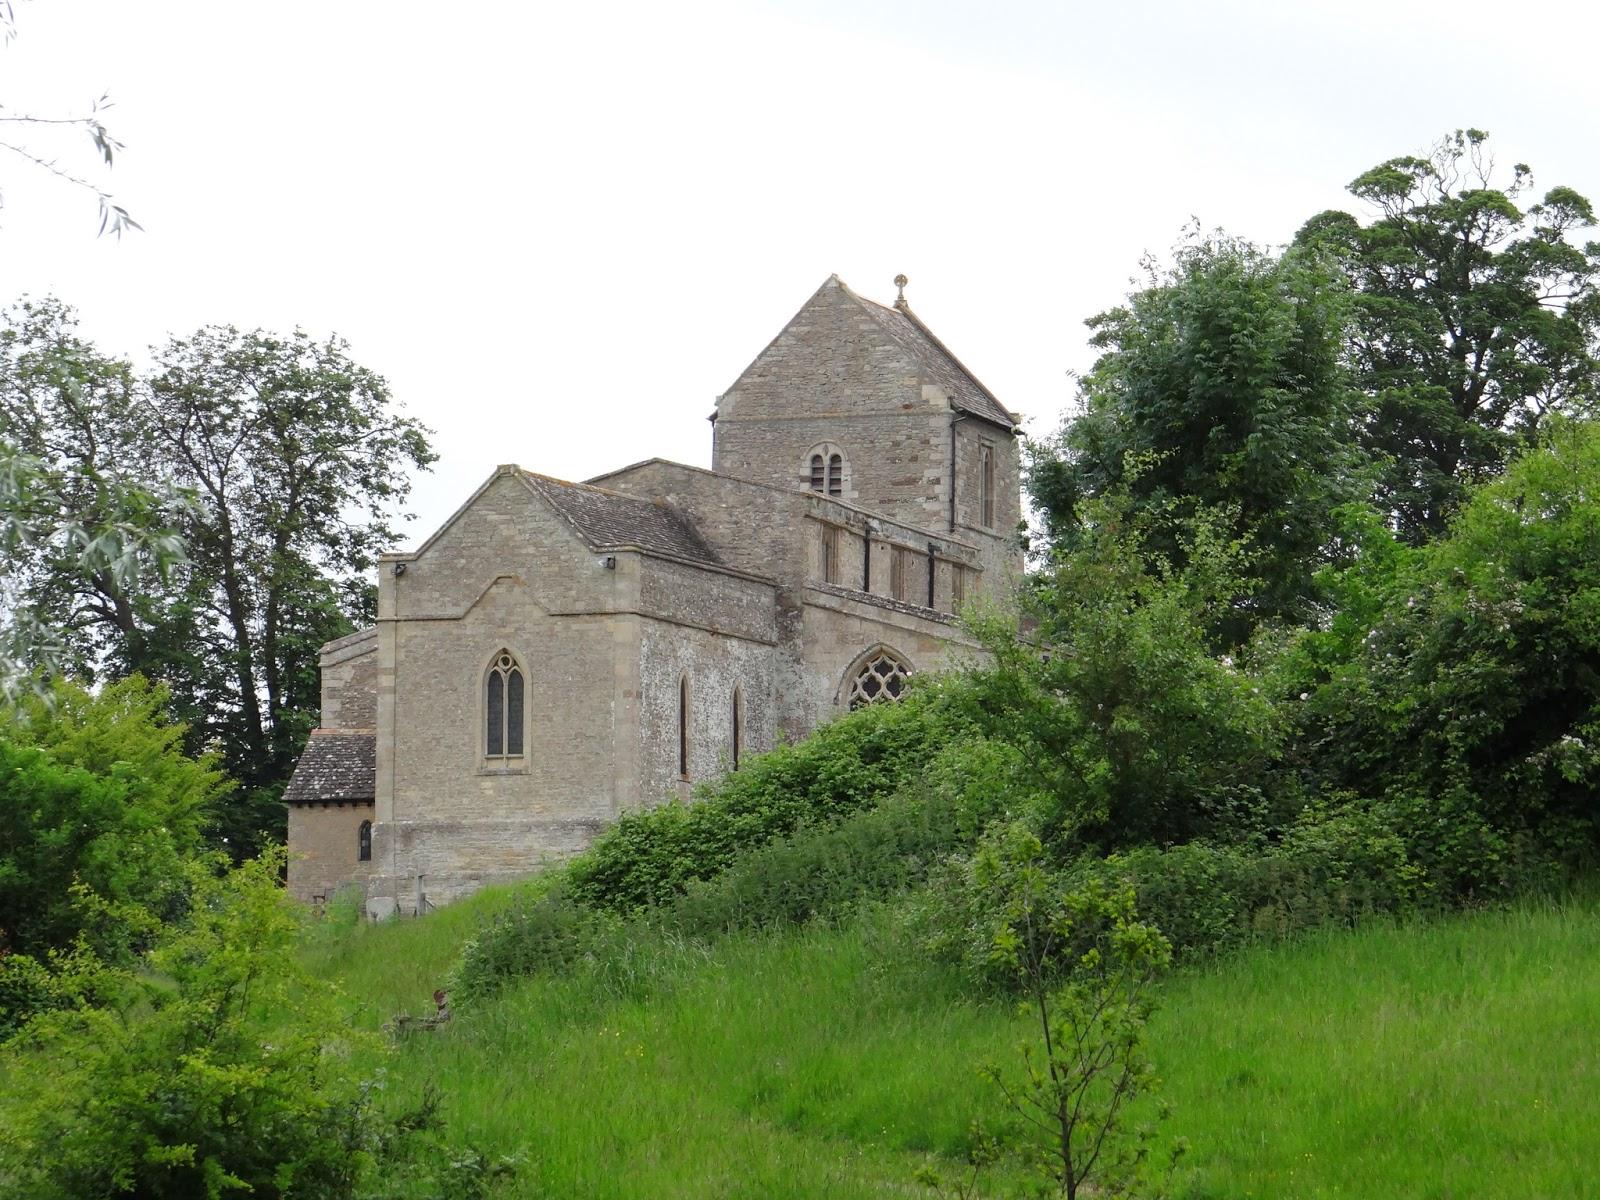 Wadenhoe Church